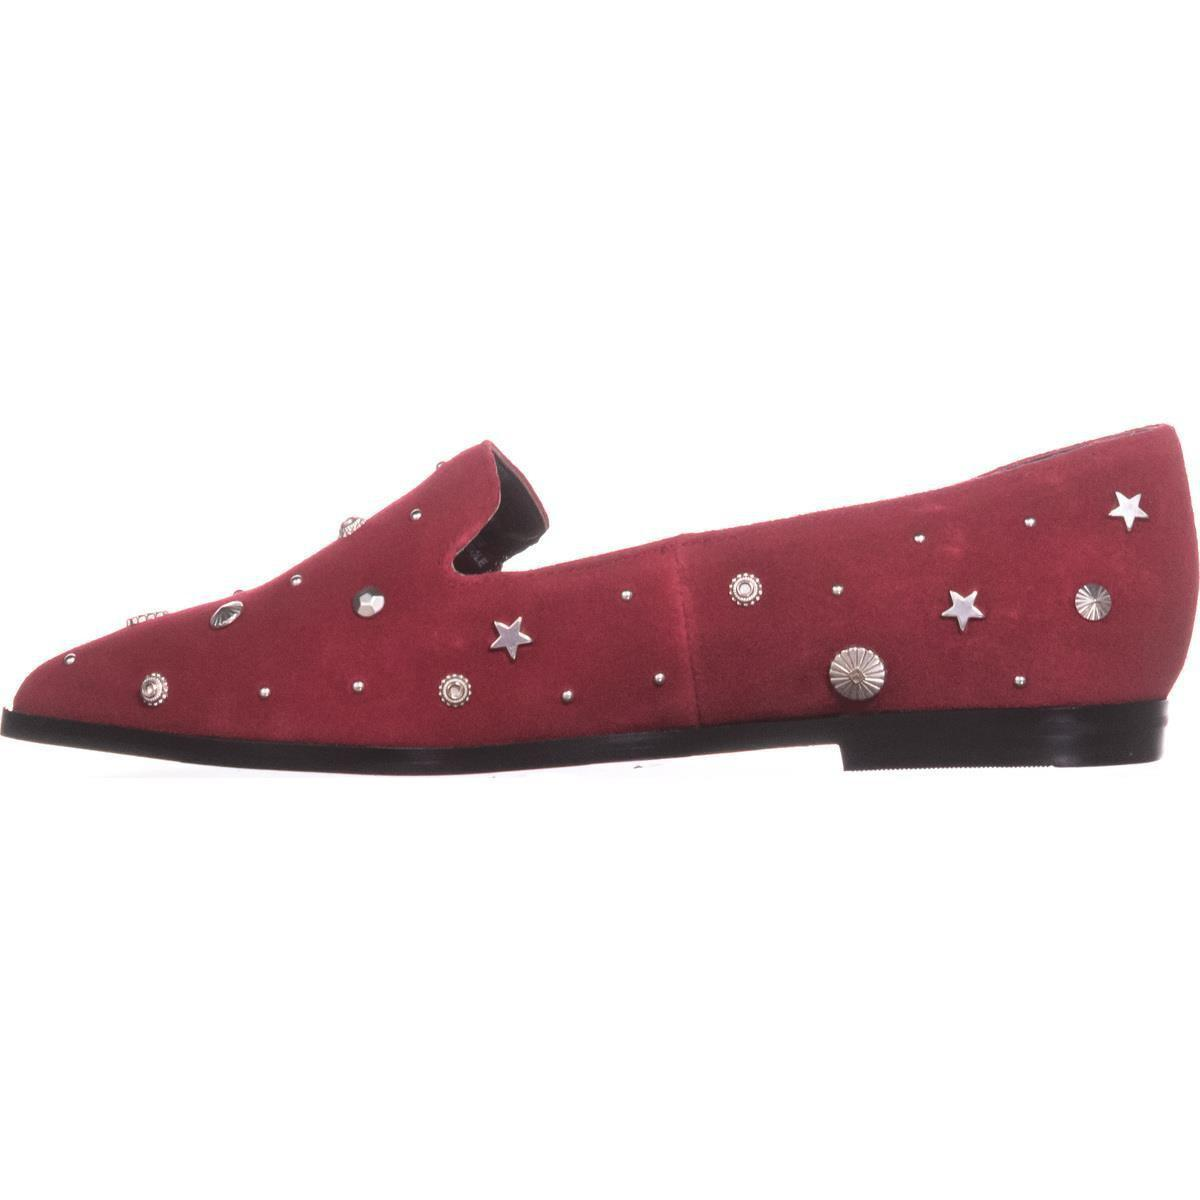 BCBGeneration BCBG Nikkola Holiday Red Suede Ornamentation Ponited Toe Flats